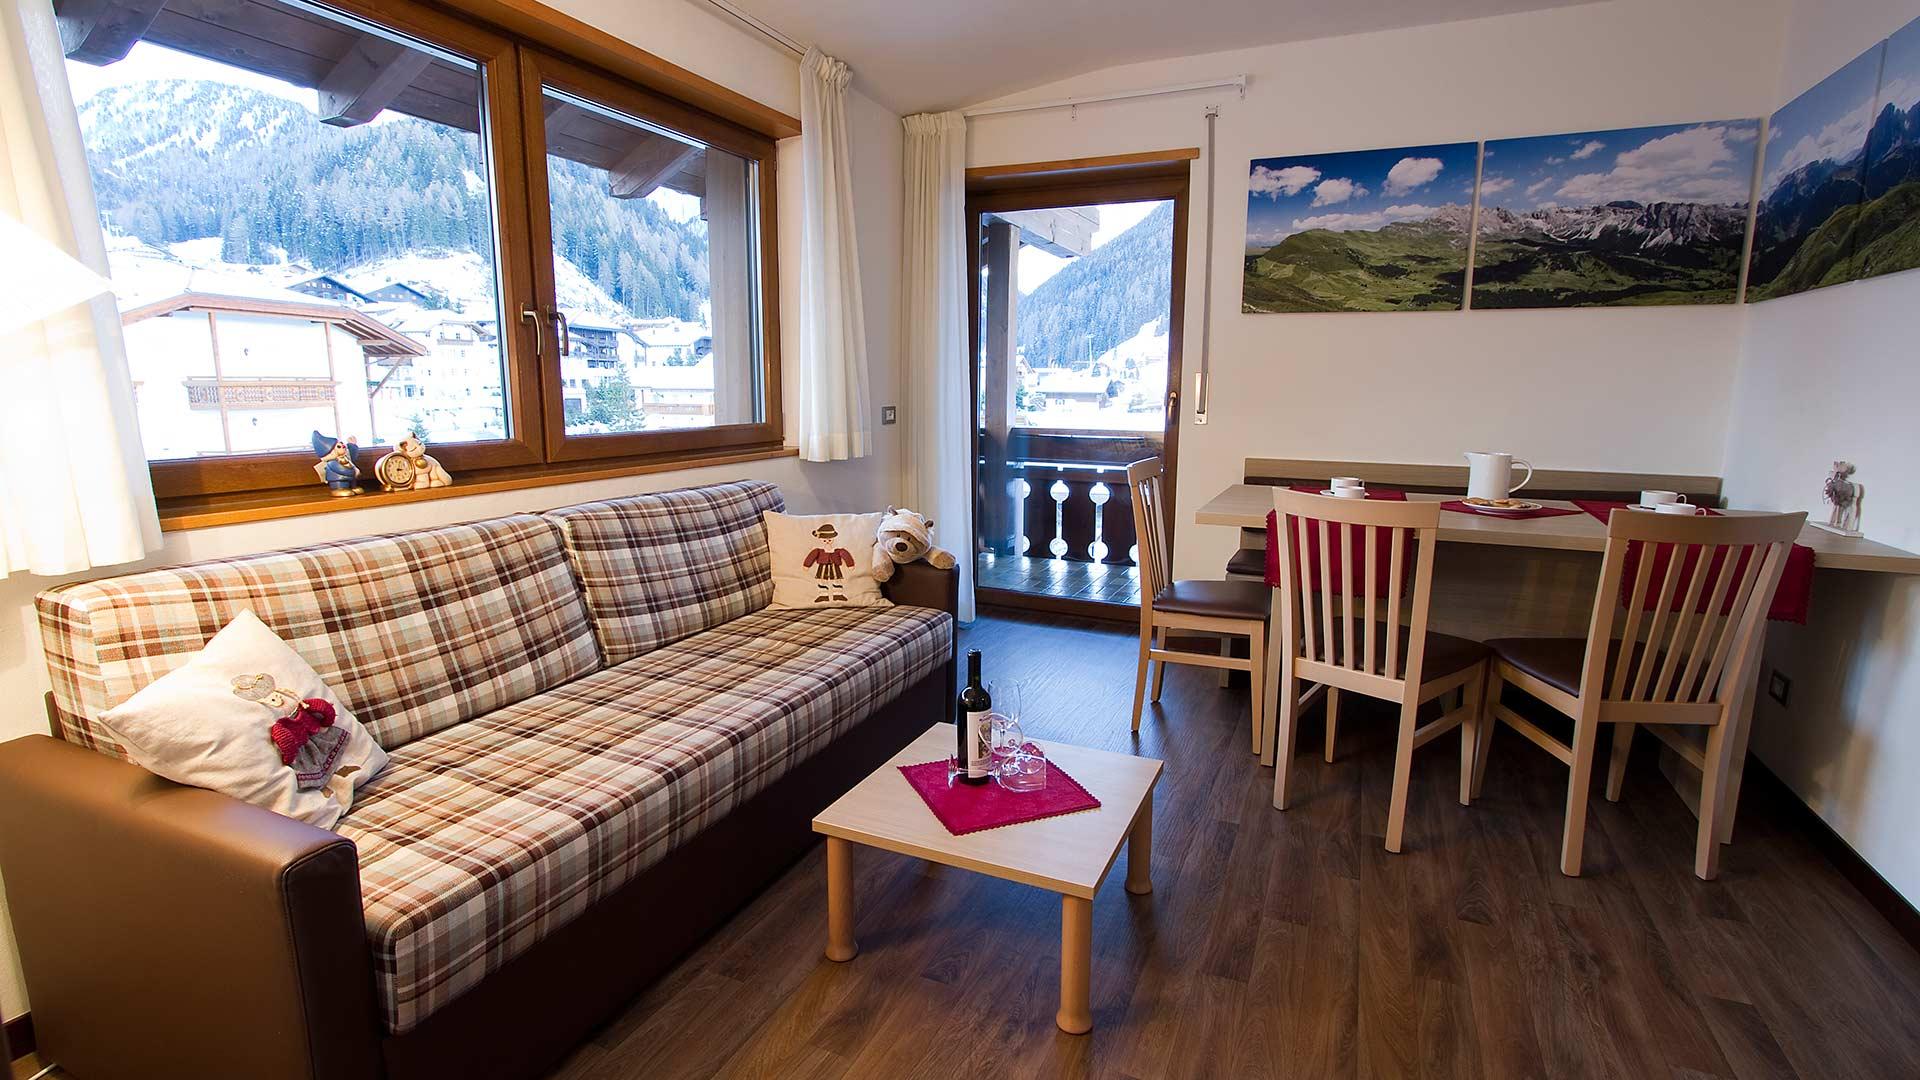 Apartments Ariola - Selva - Val Gardena - Dolomites - Italy